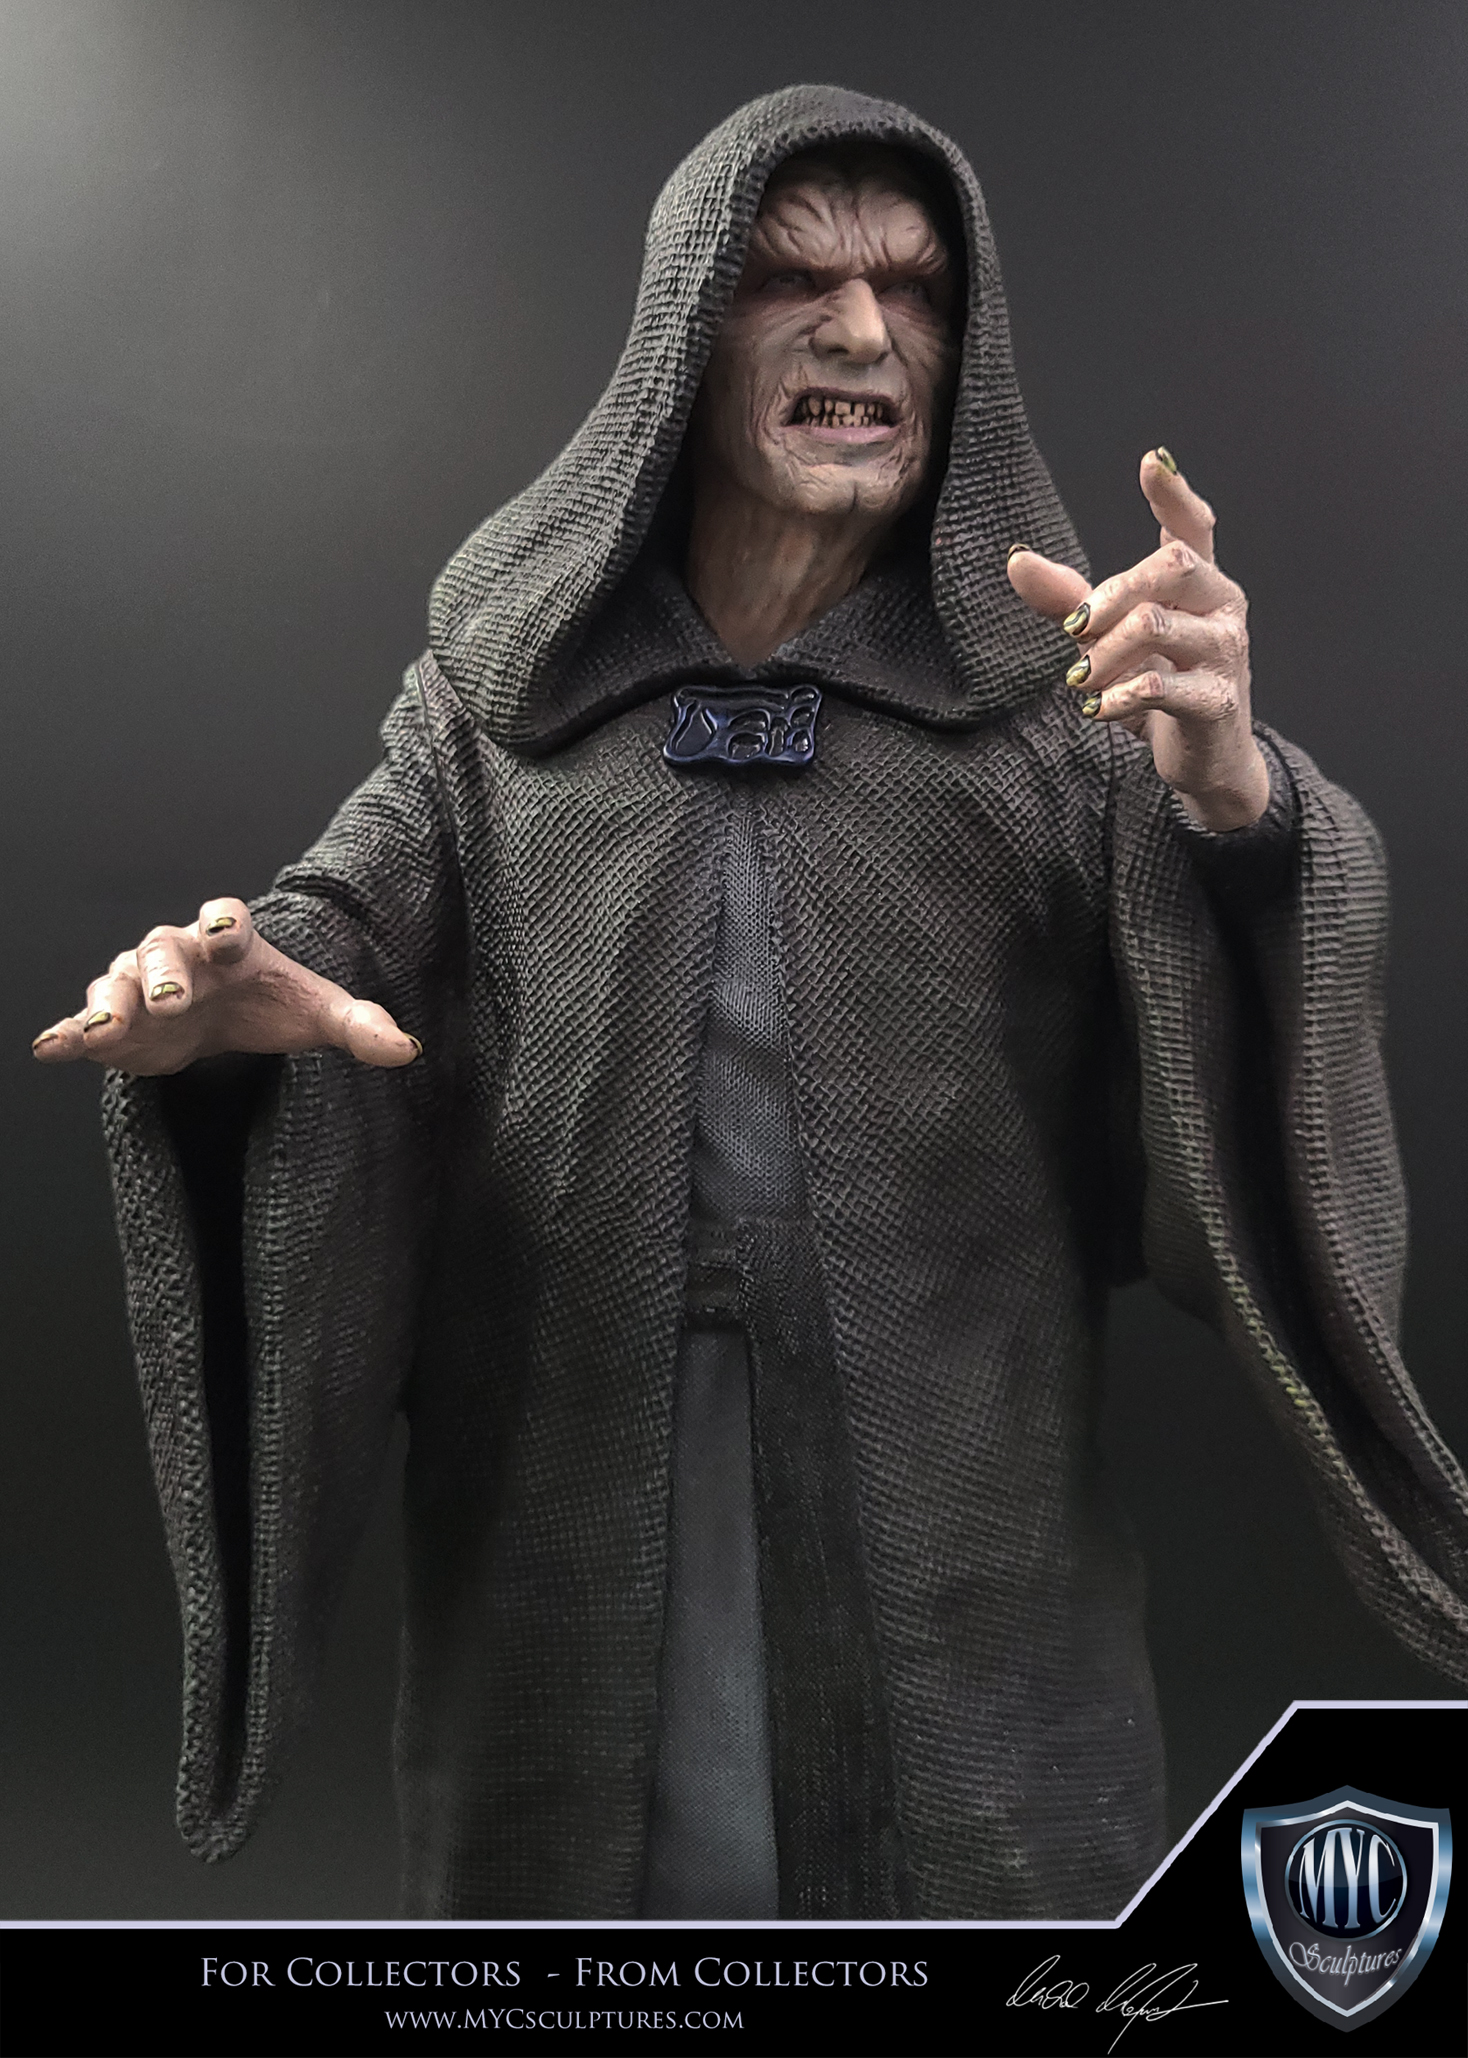 Emperor_Palpatine_MYC_Sculptures_Statue_